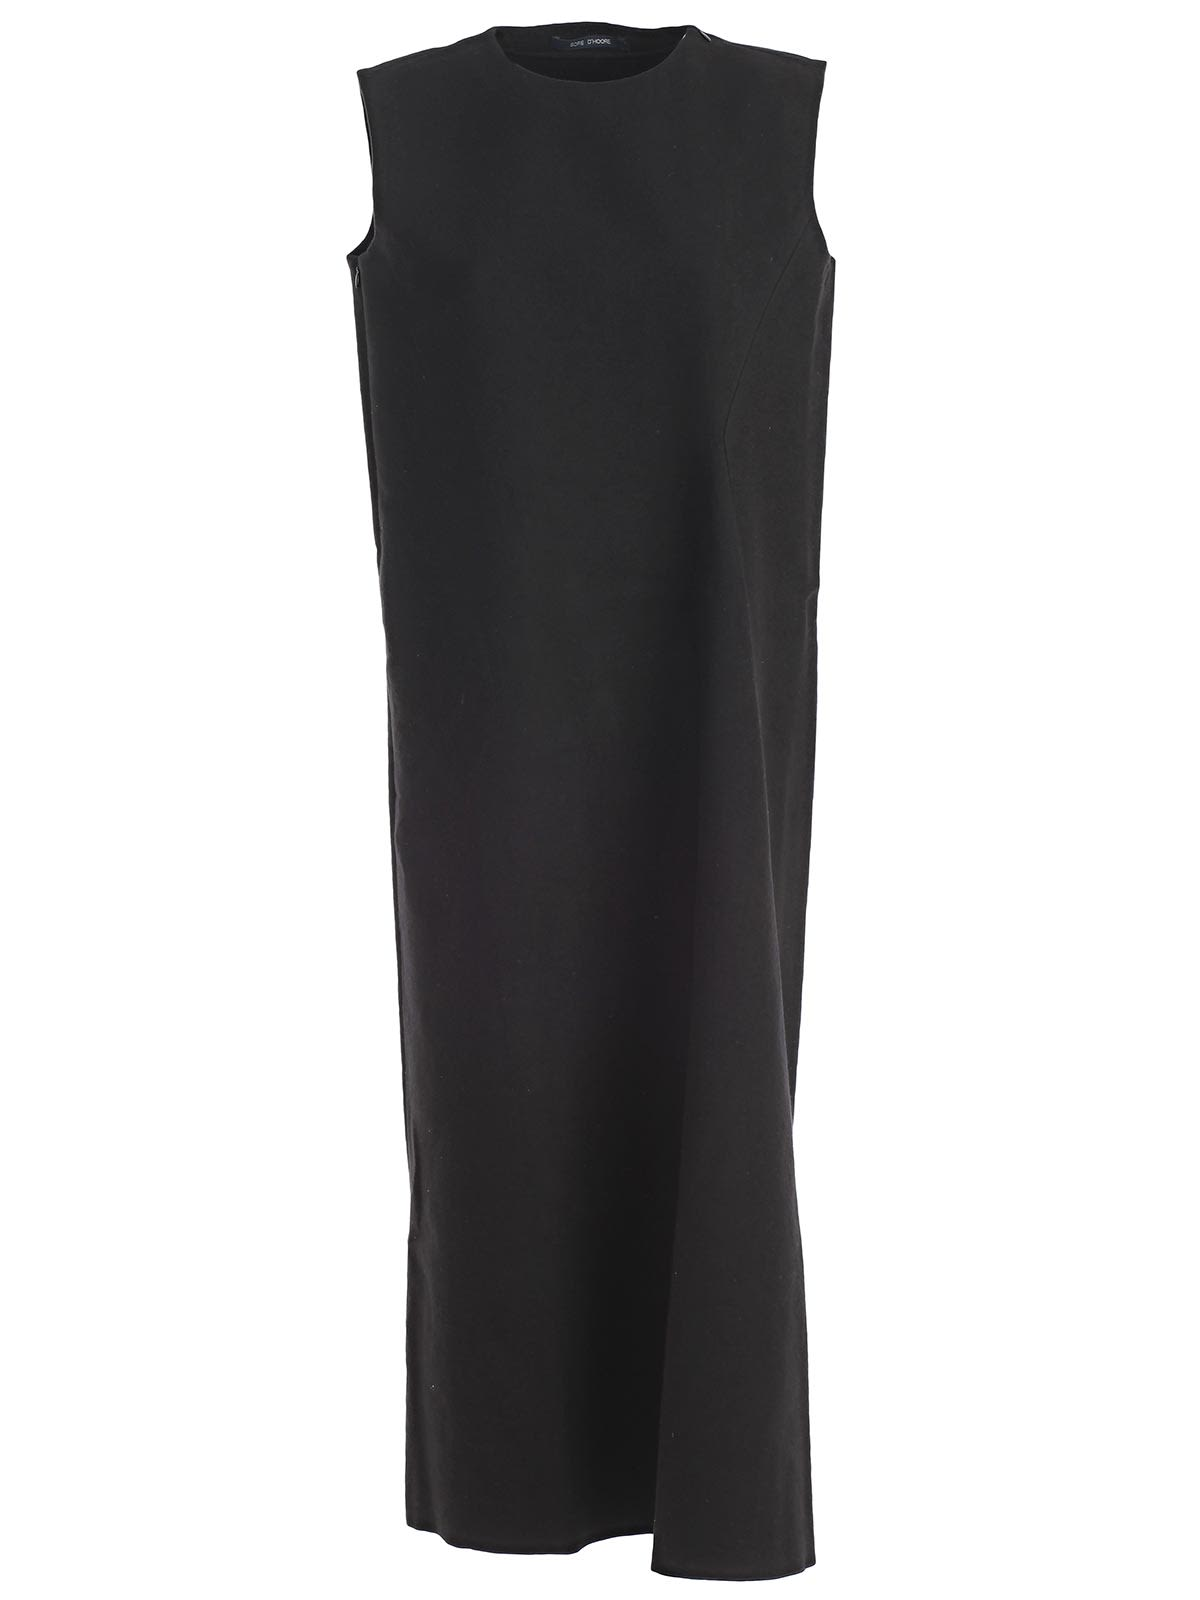 SOFIE D'HOORE Sofie D'Hoore Sleeveless Midi Dress in Black